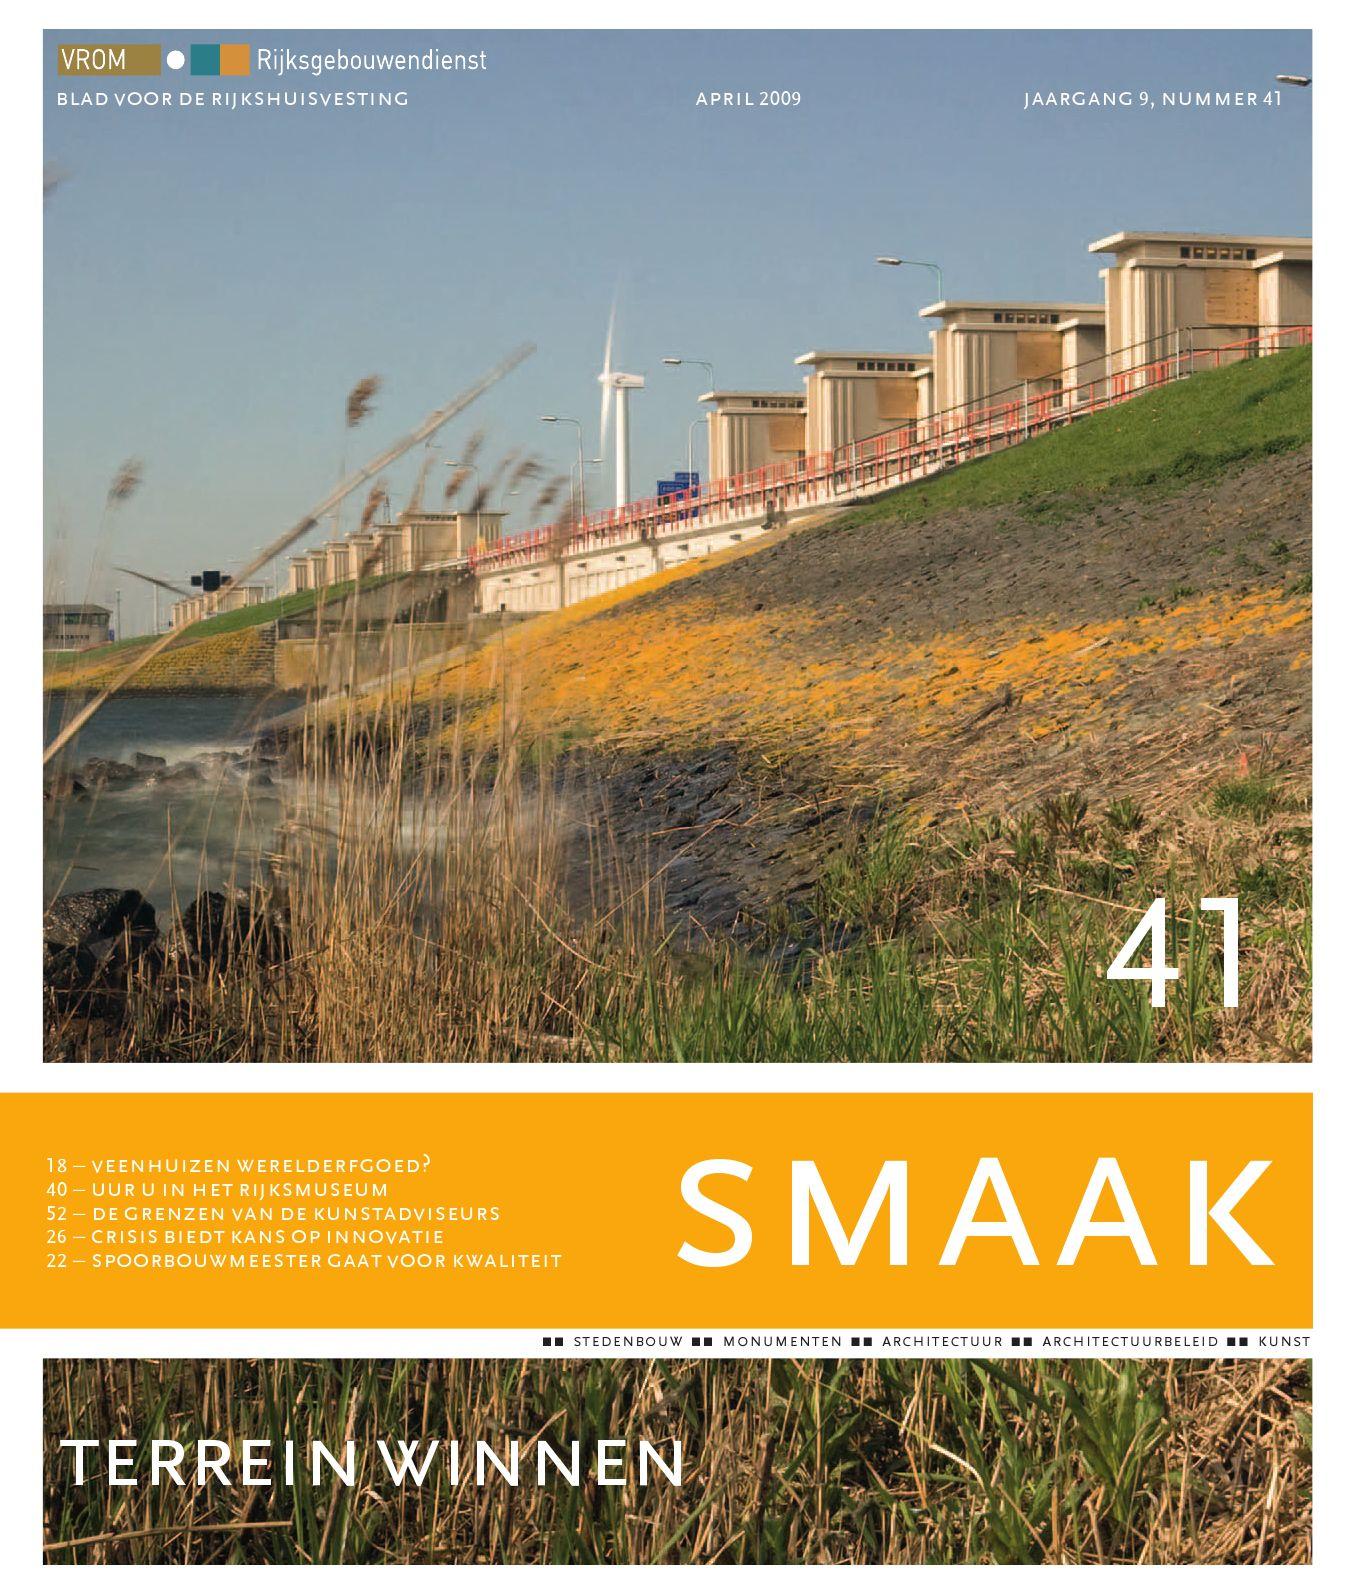 Prettig Wachten by Bureau Spoorbouwmeester - issuu